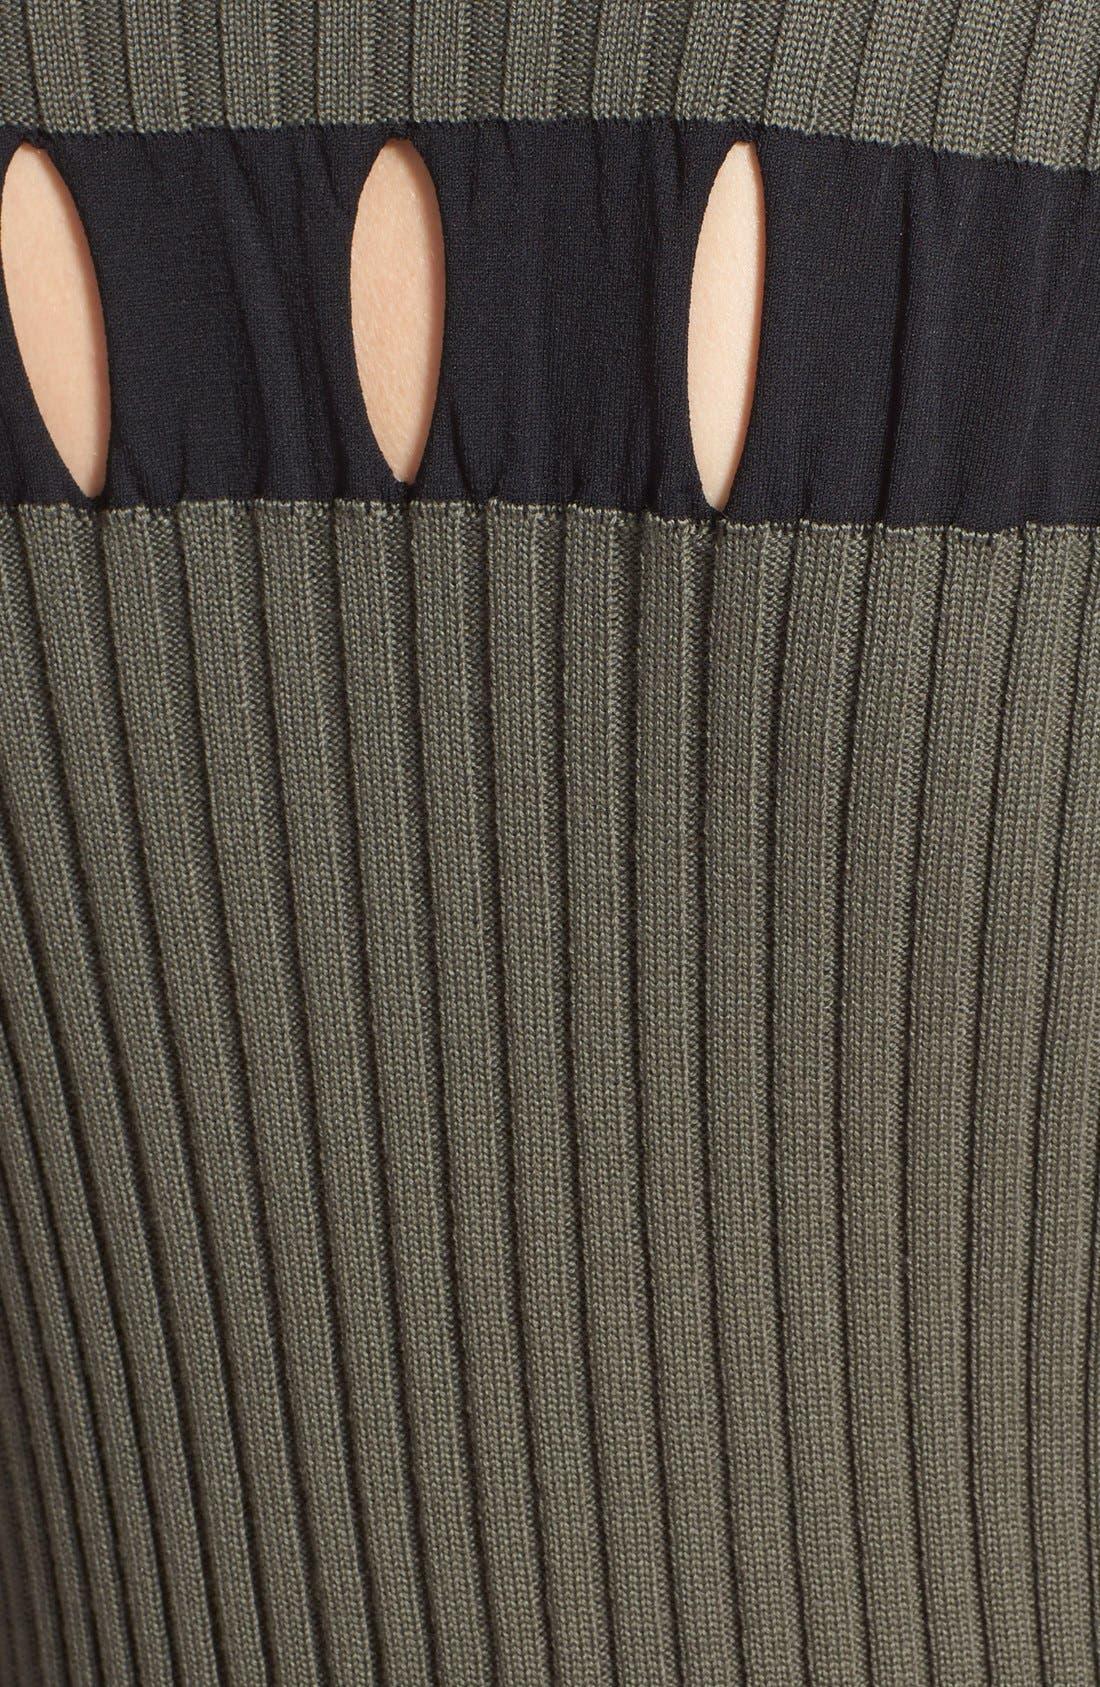 Alternate Image 3  - Alexander Wang Perforated Stripe Rib Knit Wool Dress